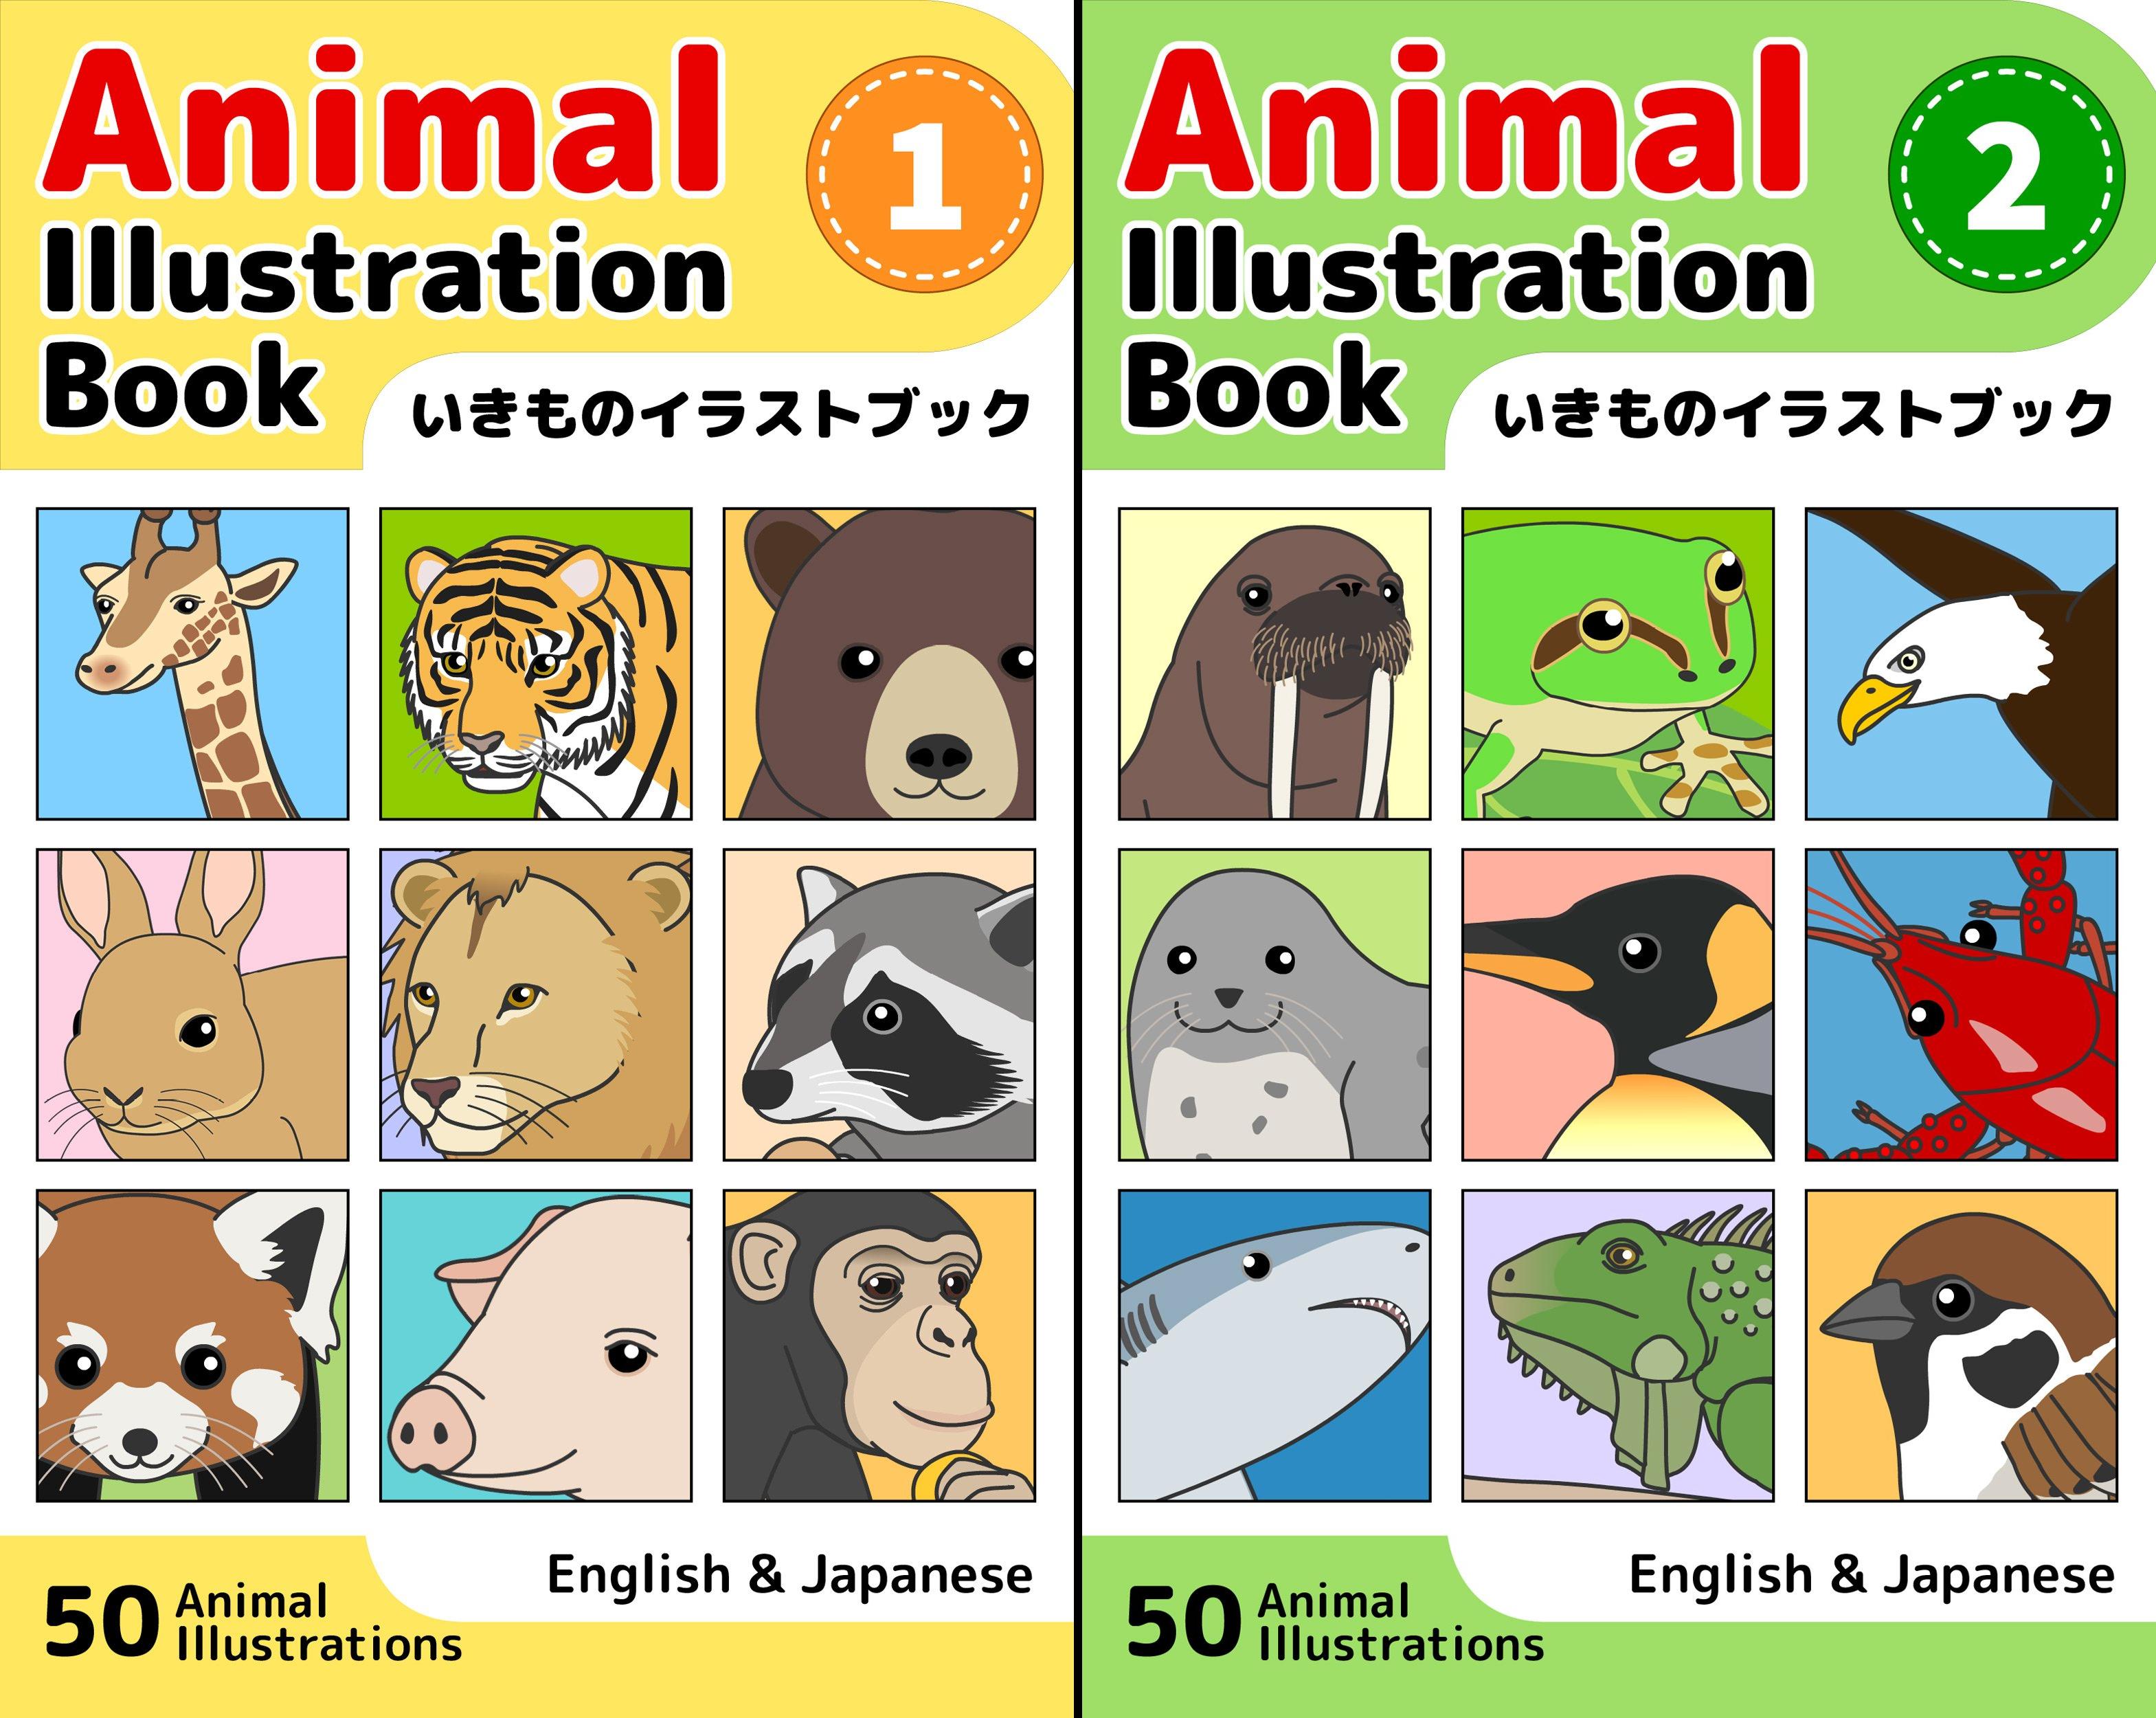 Animal Illustration Book (2 Book Series)